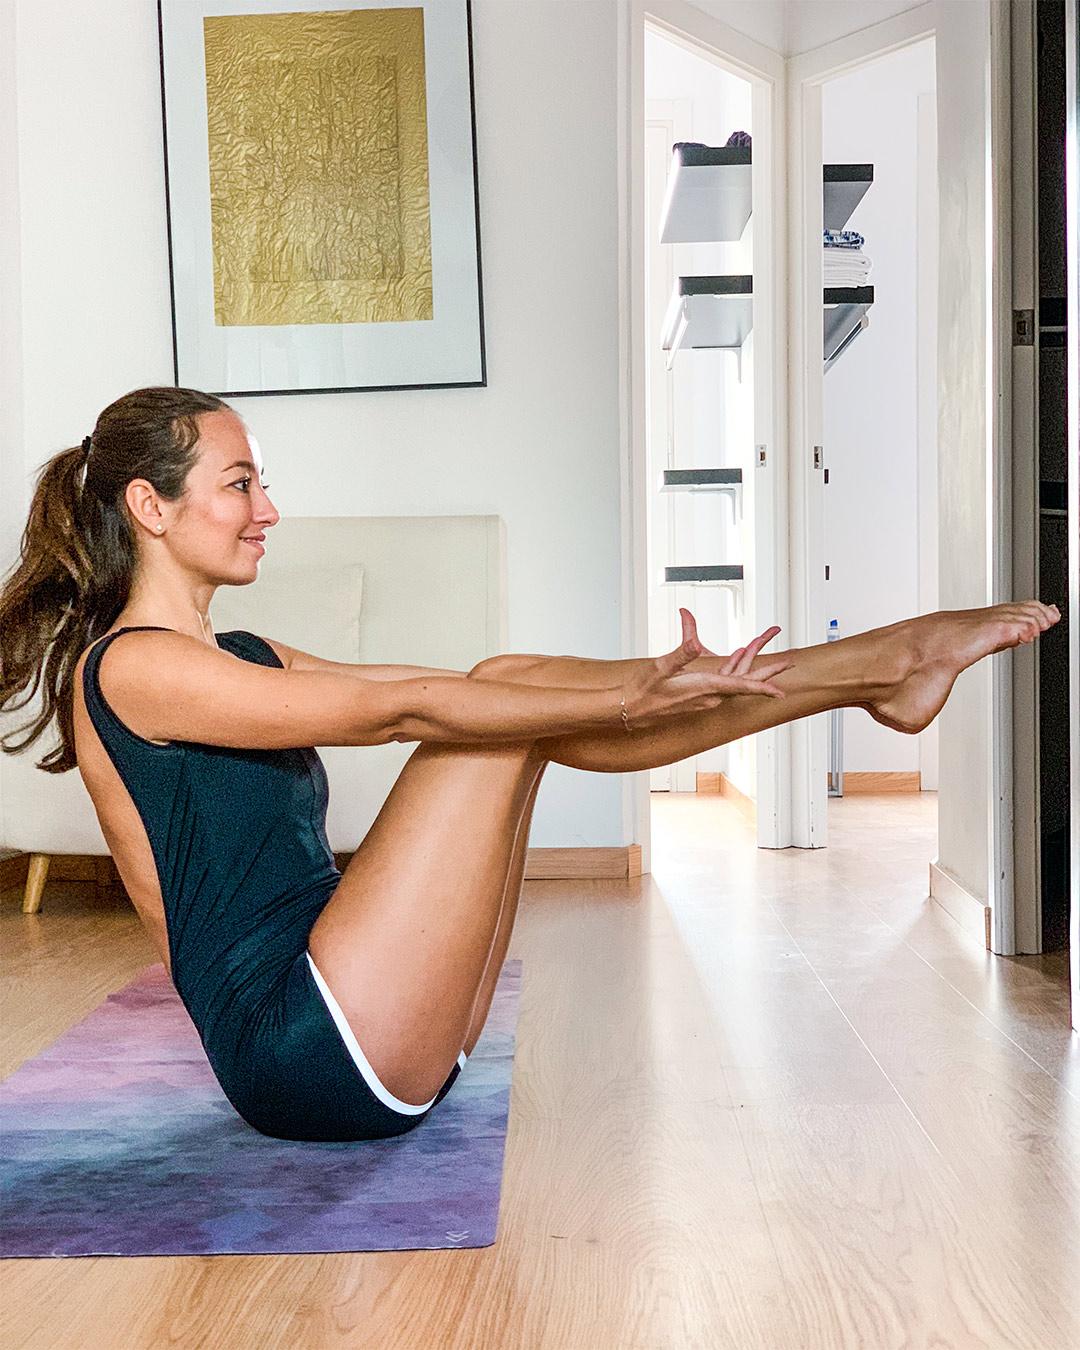 Tu Esterilla De Yoga Cómo Escogerla Yuliayogi